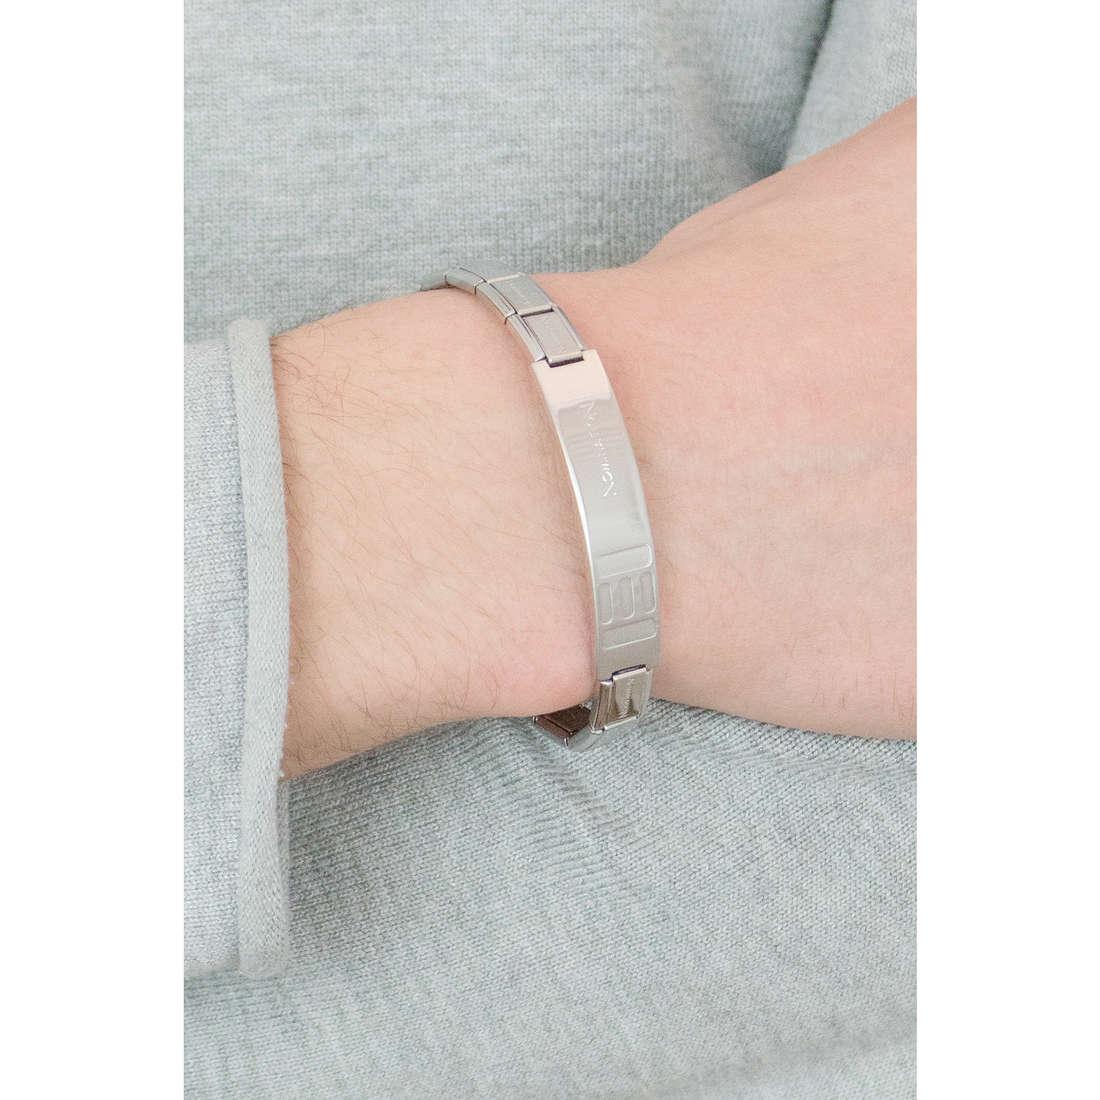 Nomination bracelets Trendsetter homme 021108/008/004 photo wearing